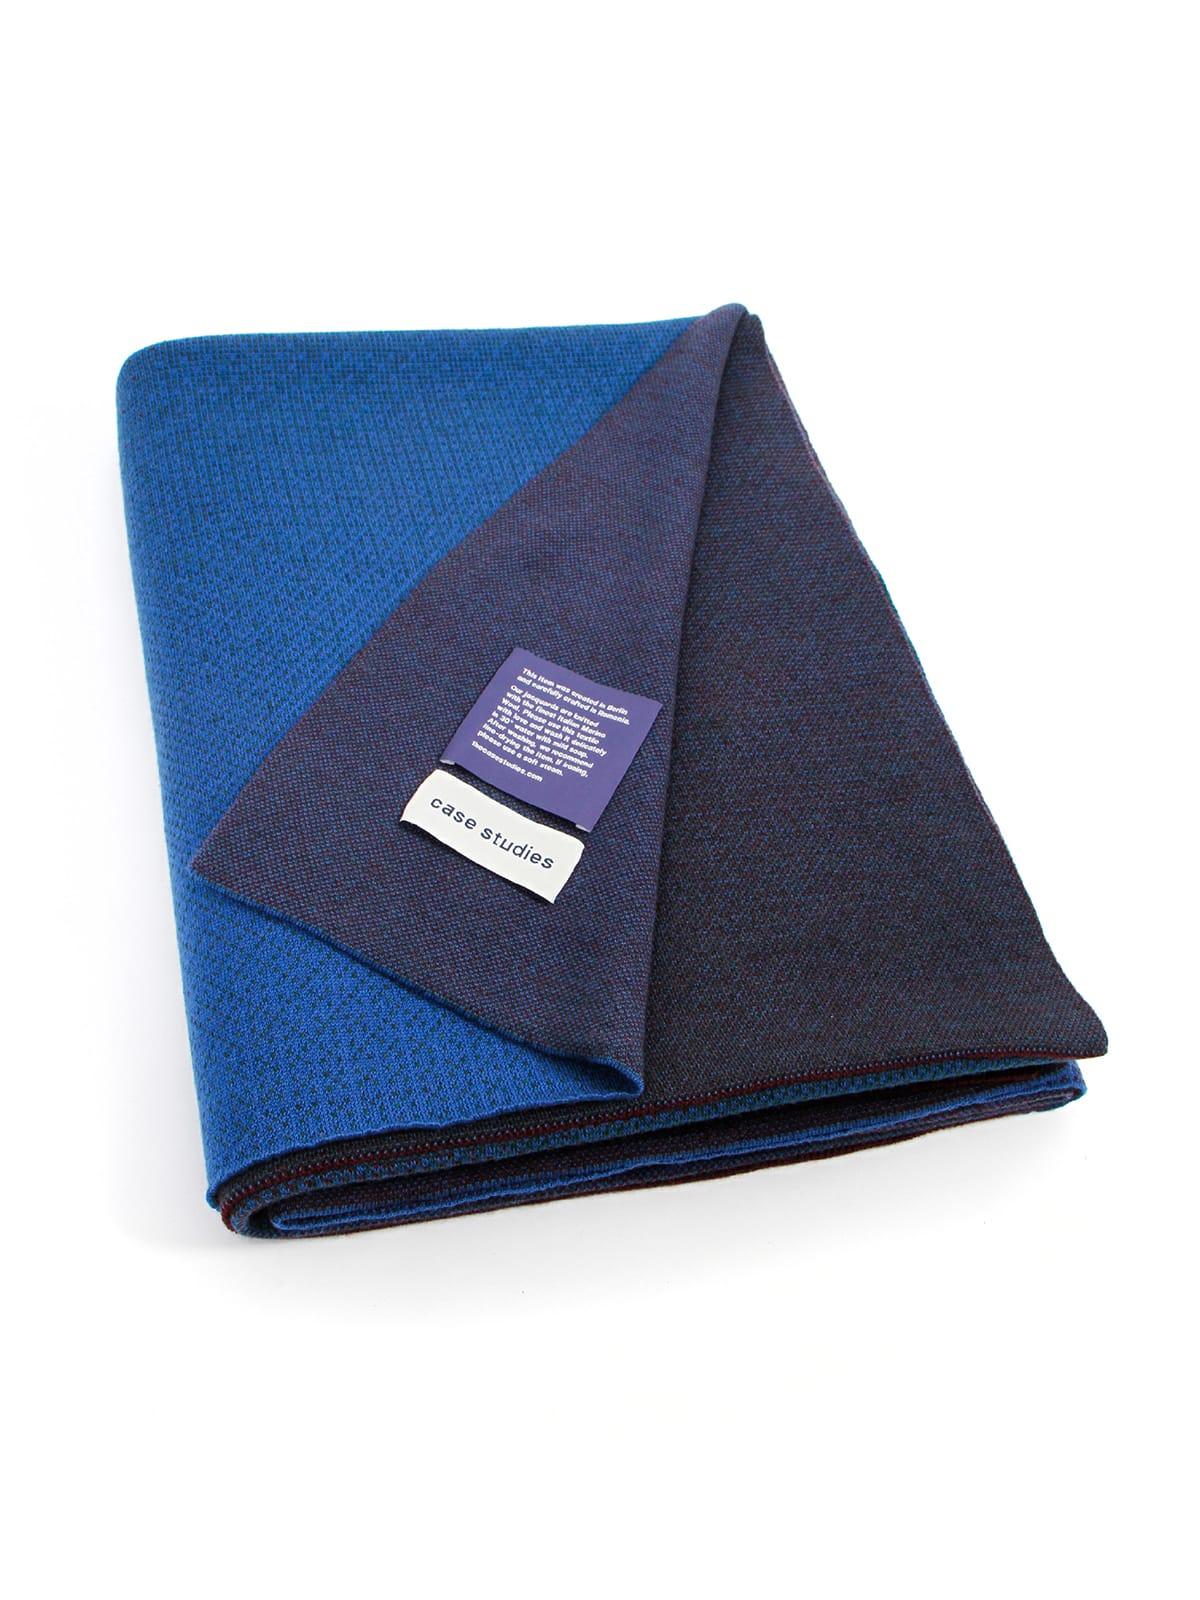 Knitted Blanket Venice - Merino Wool folded